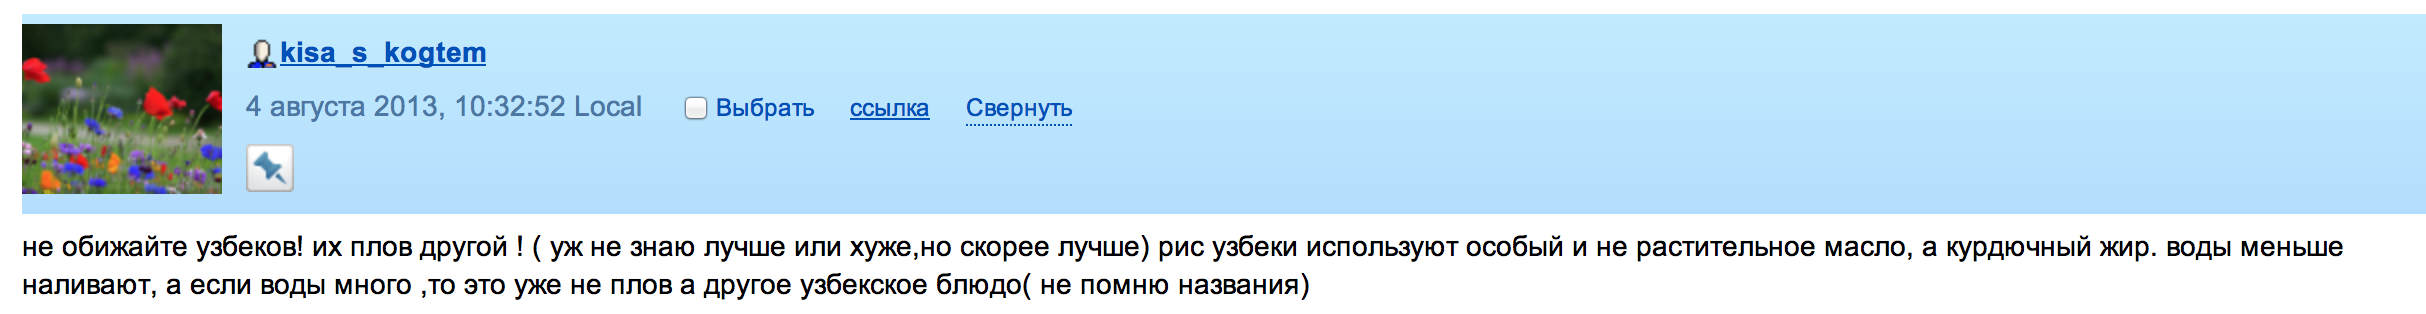 Снимок экрана 2013-08-04 в 12.06.51